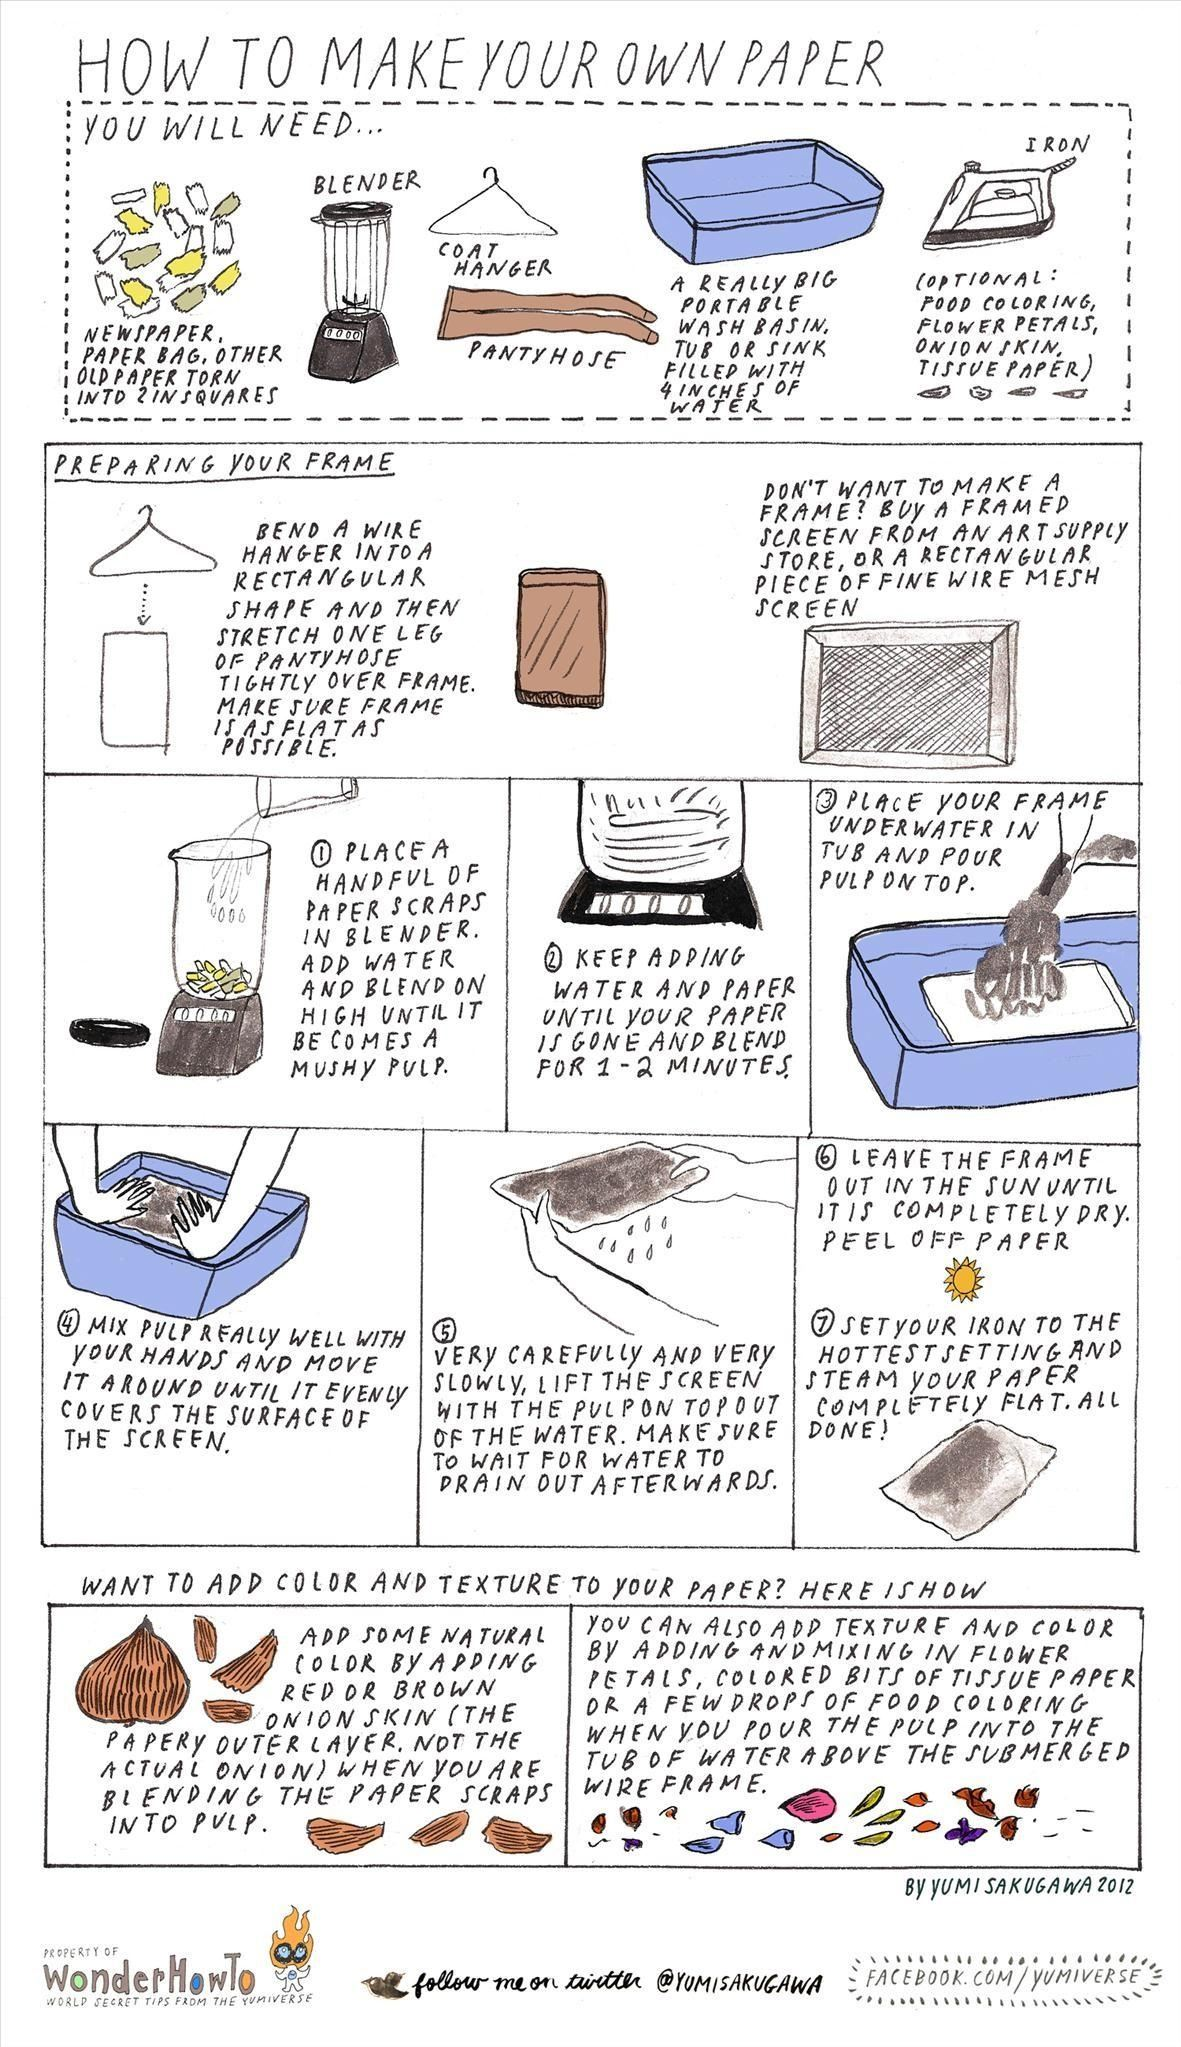 where to print a cardboard document